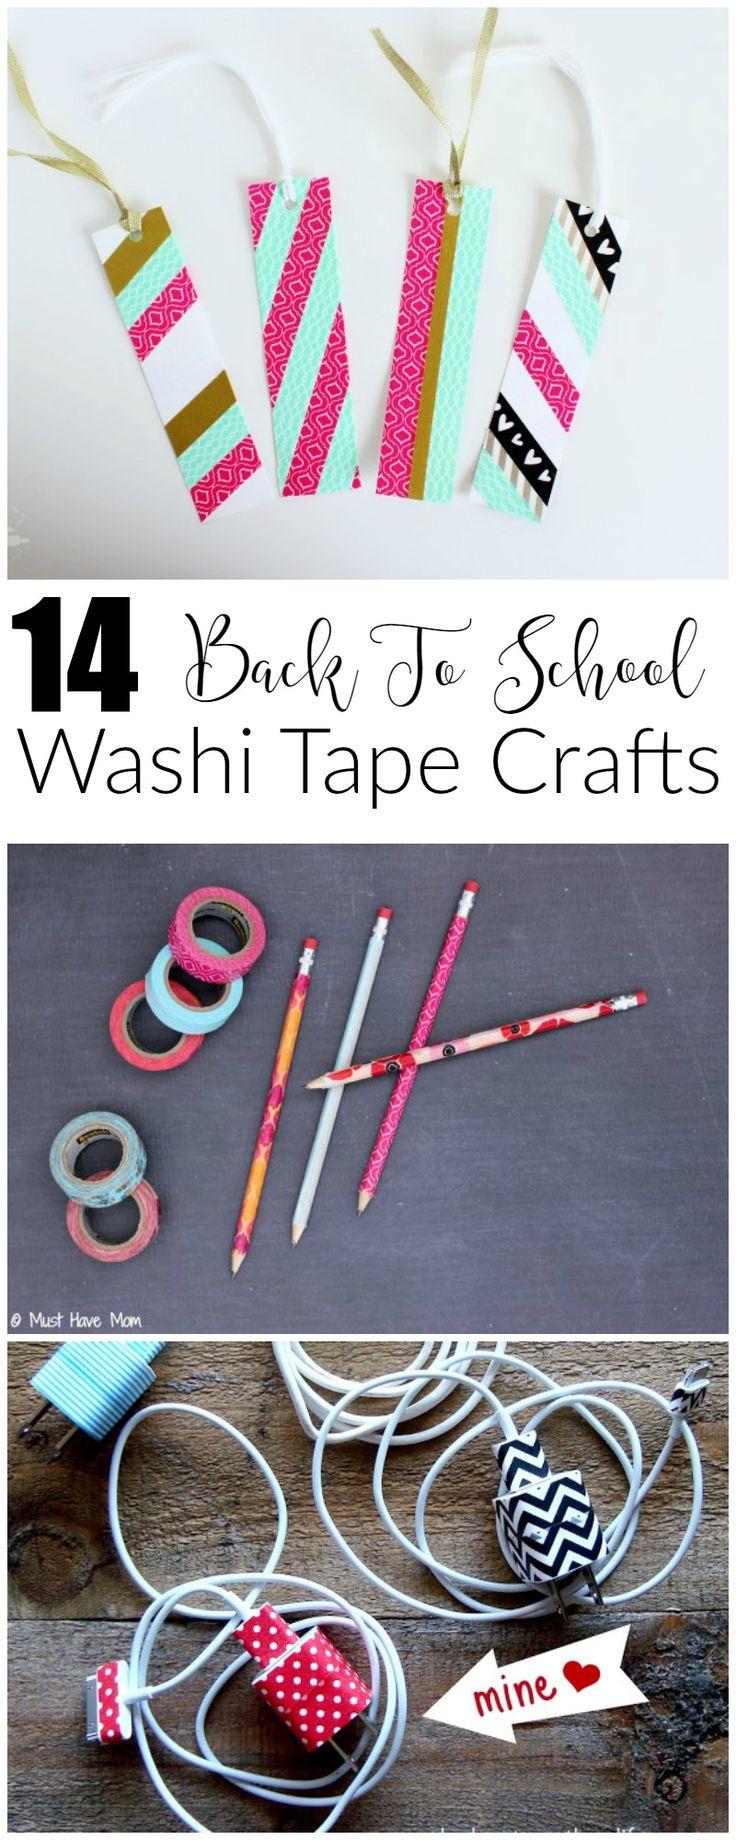 '14 Back to School Washi Tape Crafts...!' (via The Kolb Corner)